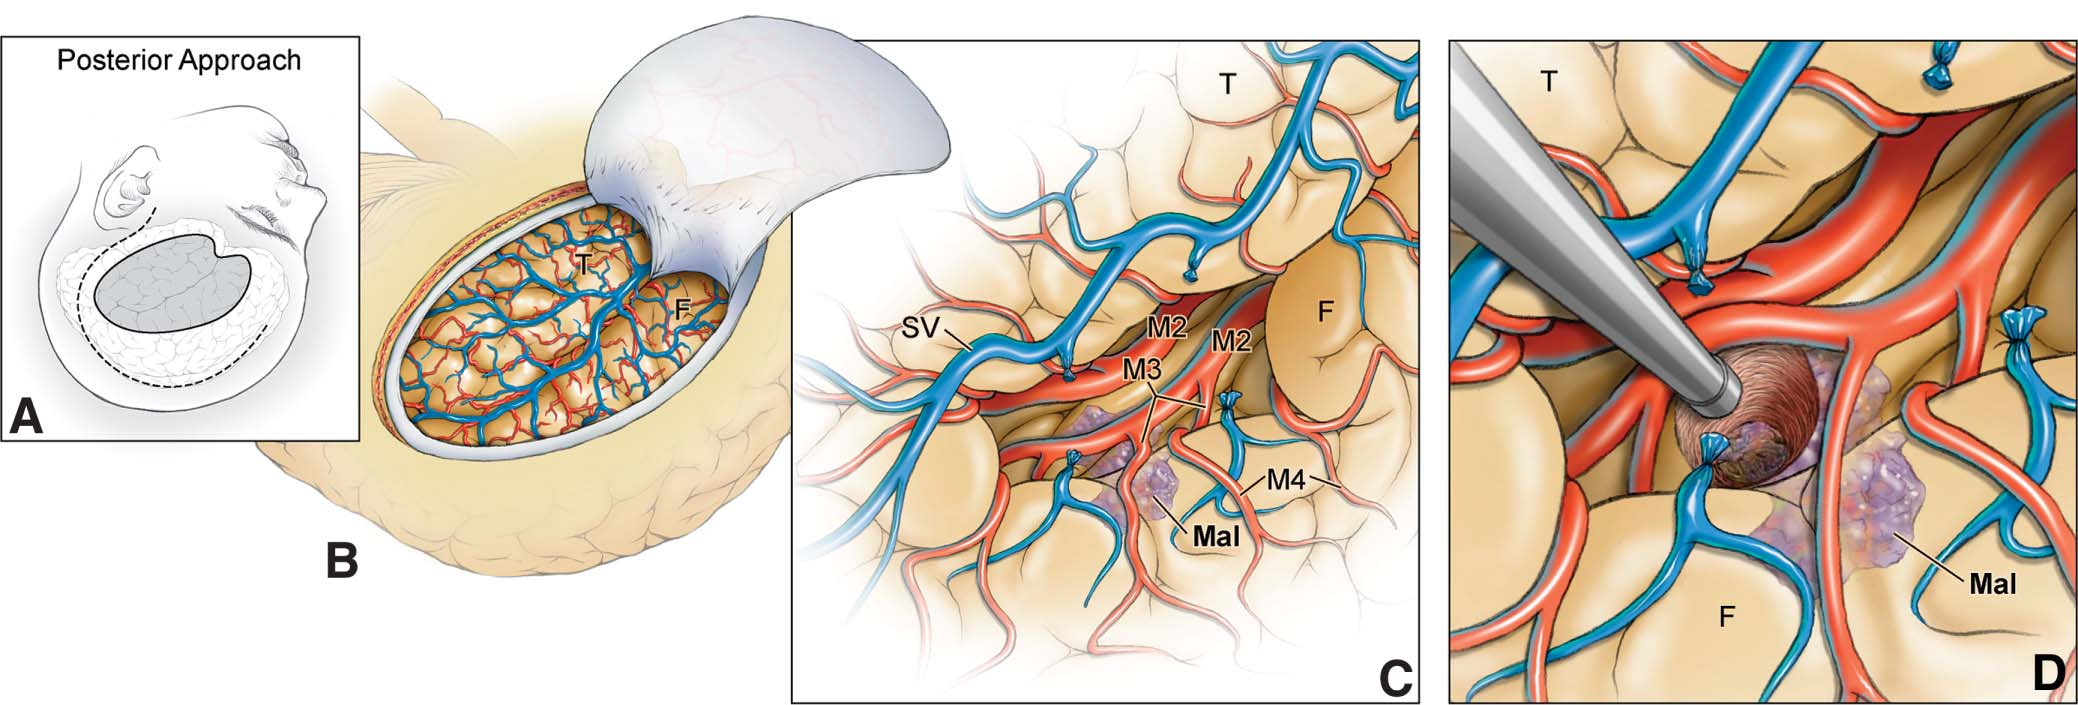 transsylvian_approach [Operative Neurosurgery]